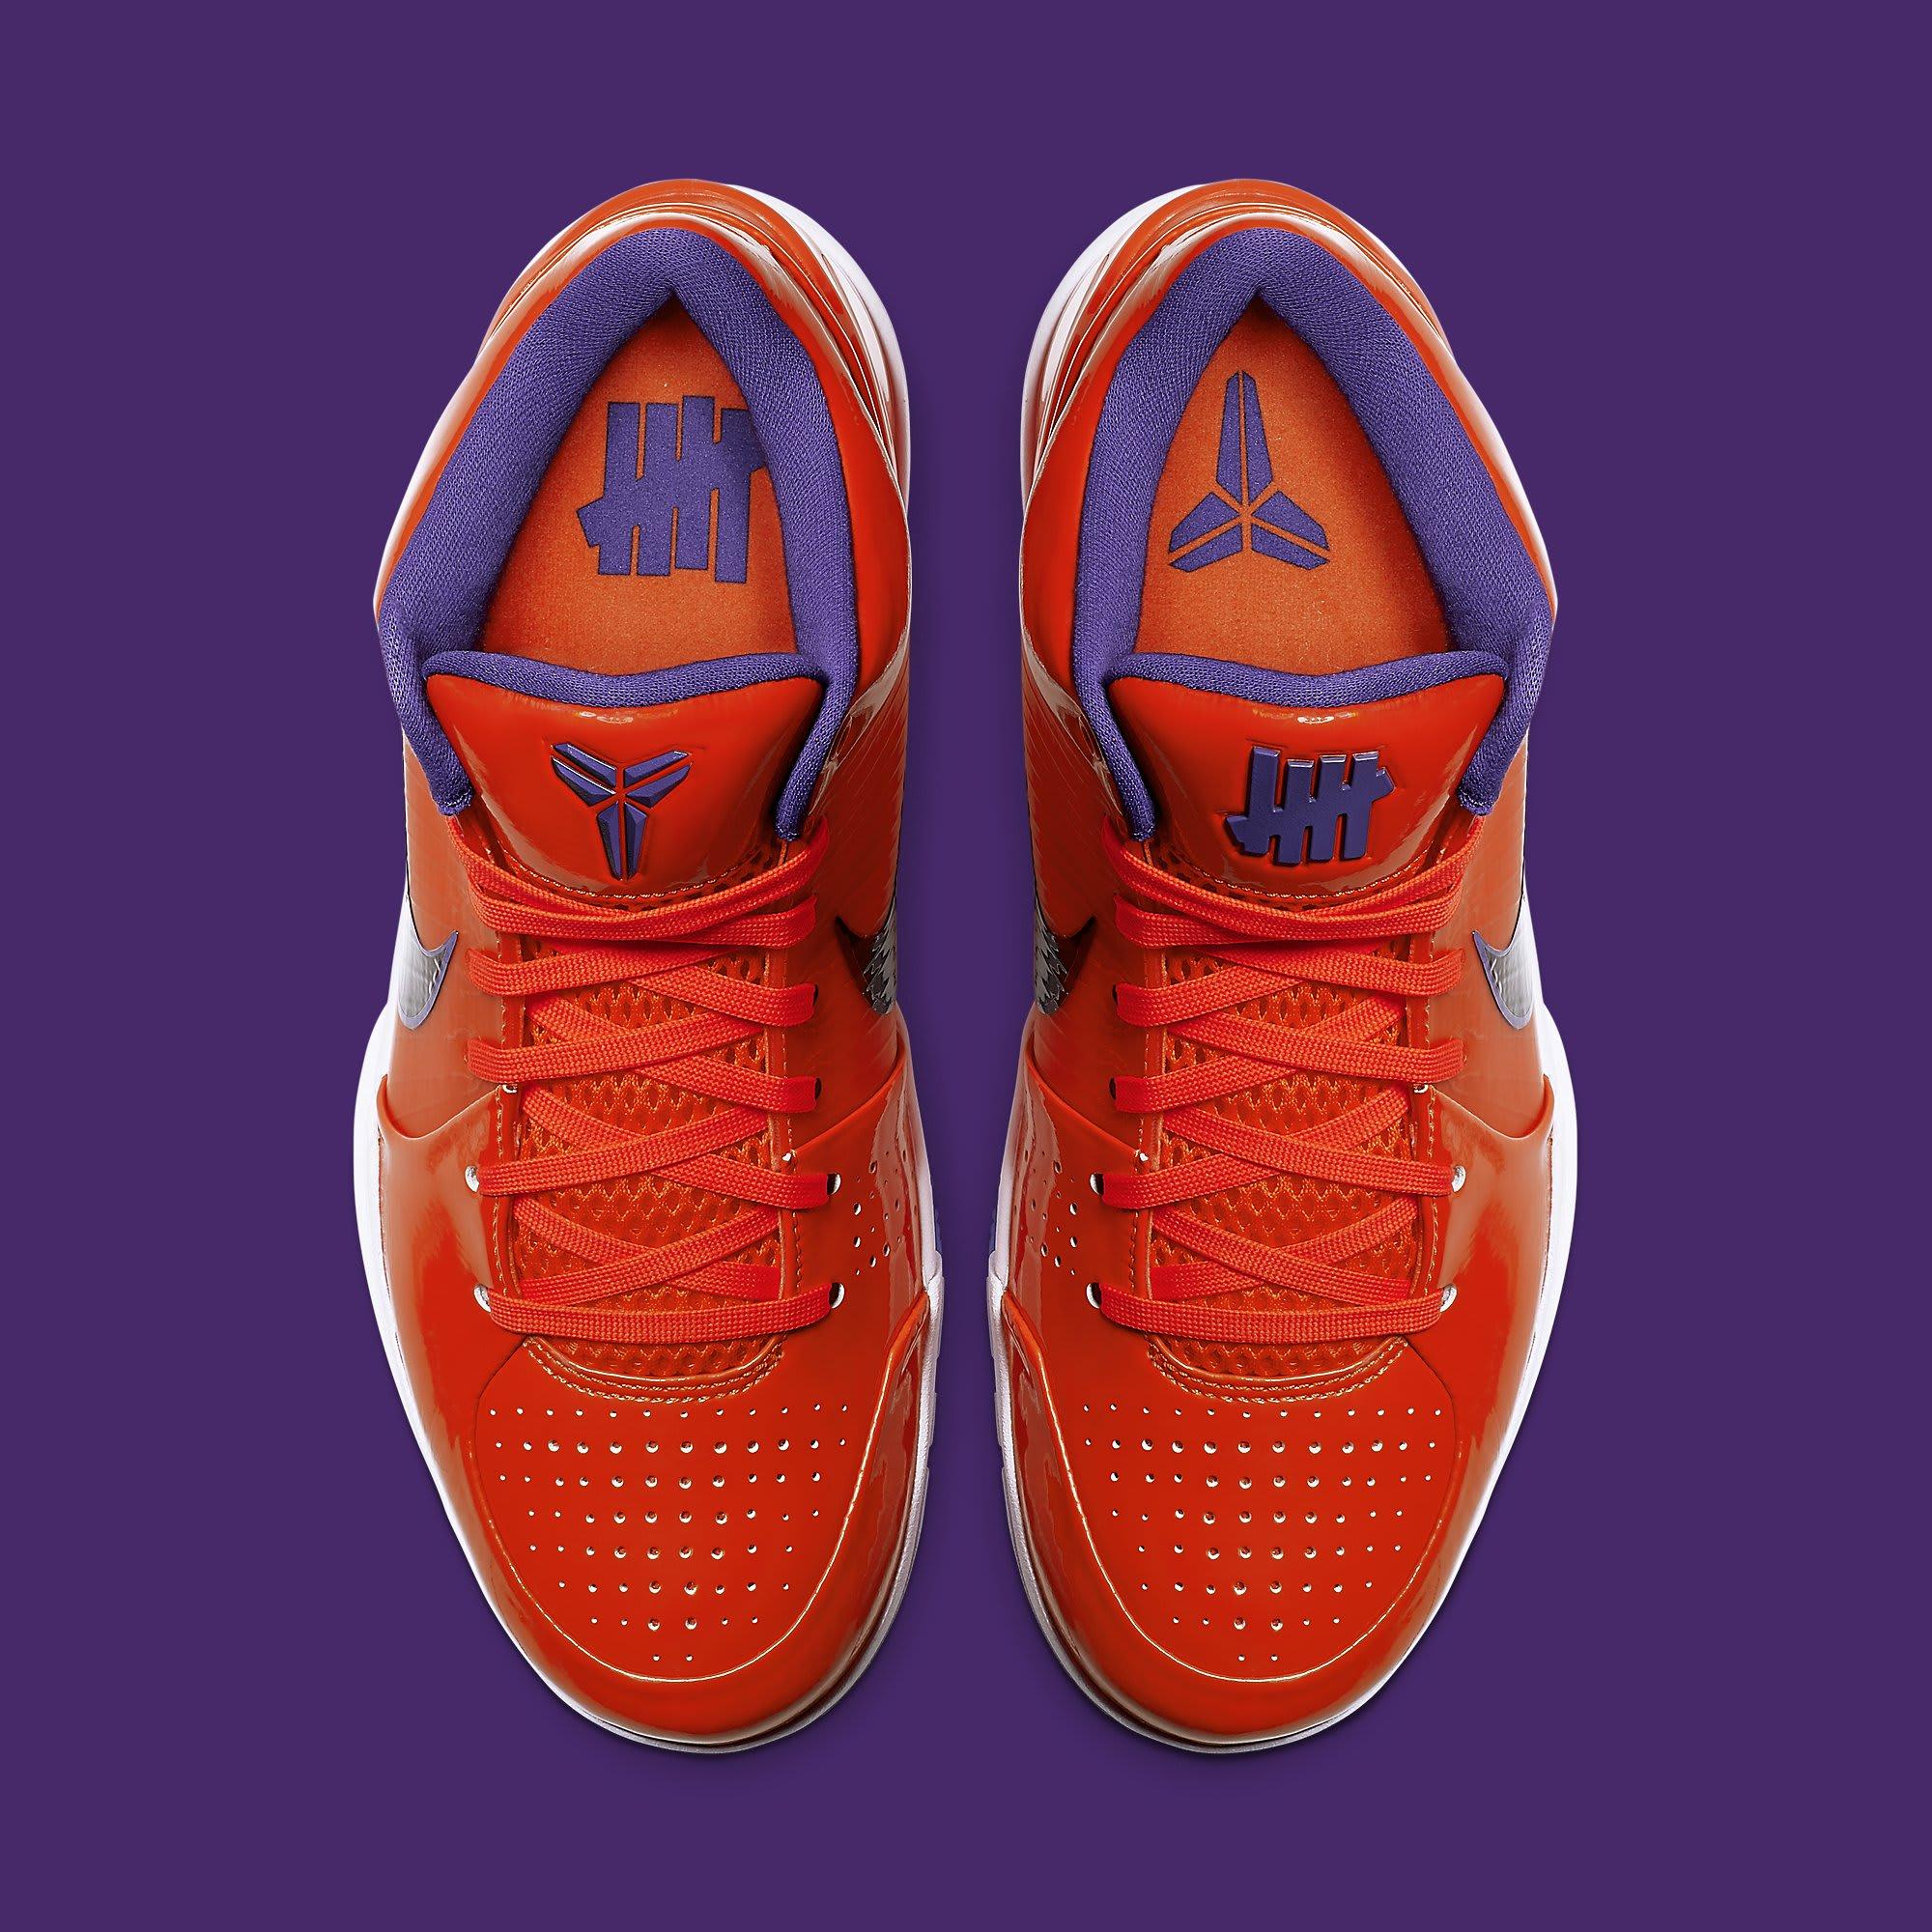 UNDFTD x Nike Kobe 4 Protro Orange Release Date CQ33869-800 Top